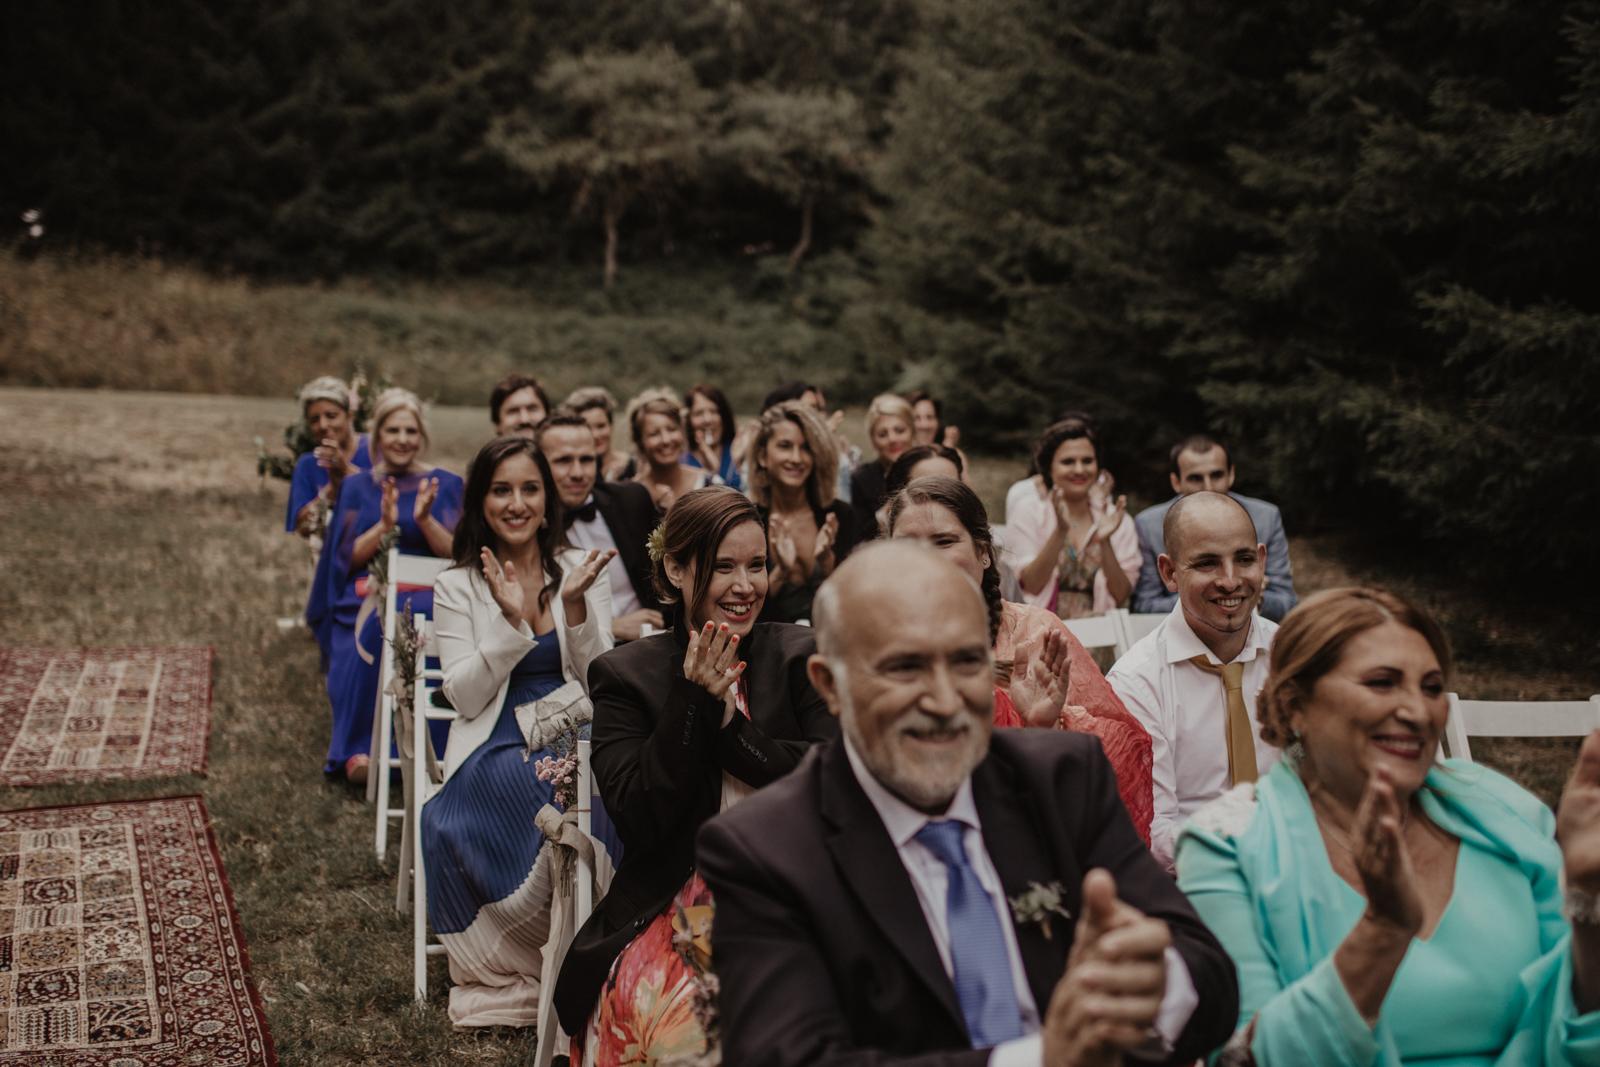 thenortherngirlphotography_photography_thenortherngirl_rebeccascabros_wedding_weddingphotography_weddingphotographer_barcelona_bodaenbarcelona_bodaenmaselmarti_bodarogeryvane-421.jpg